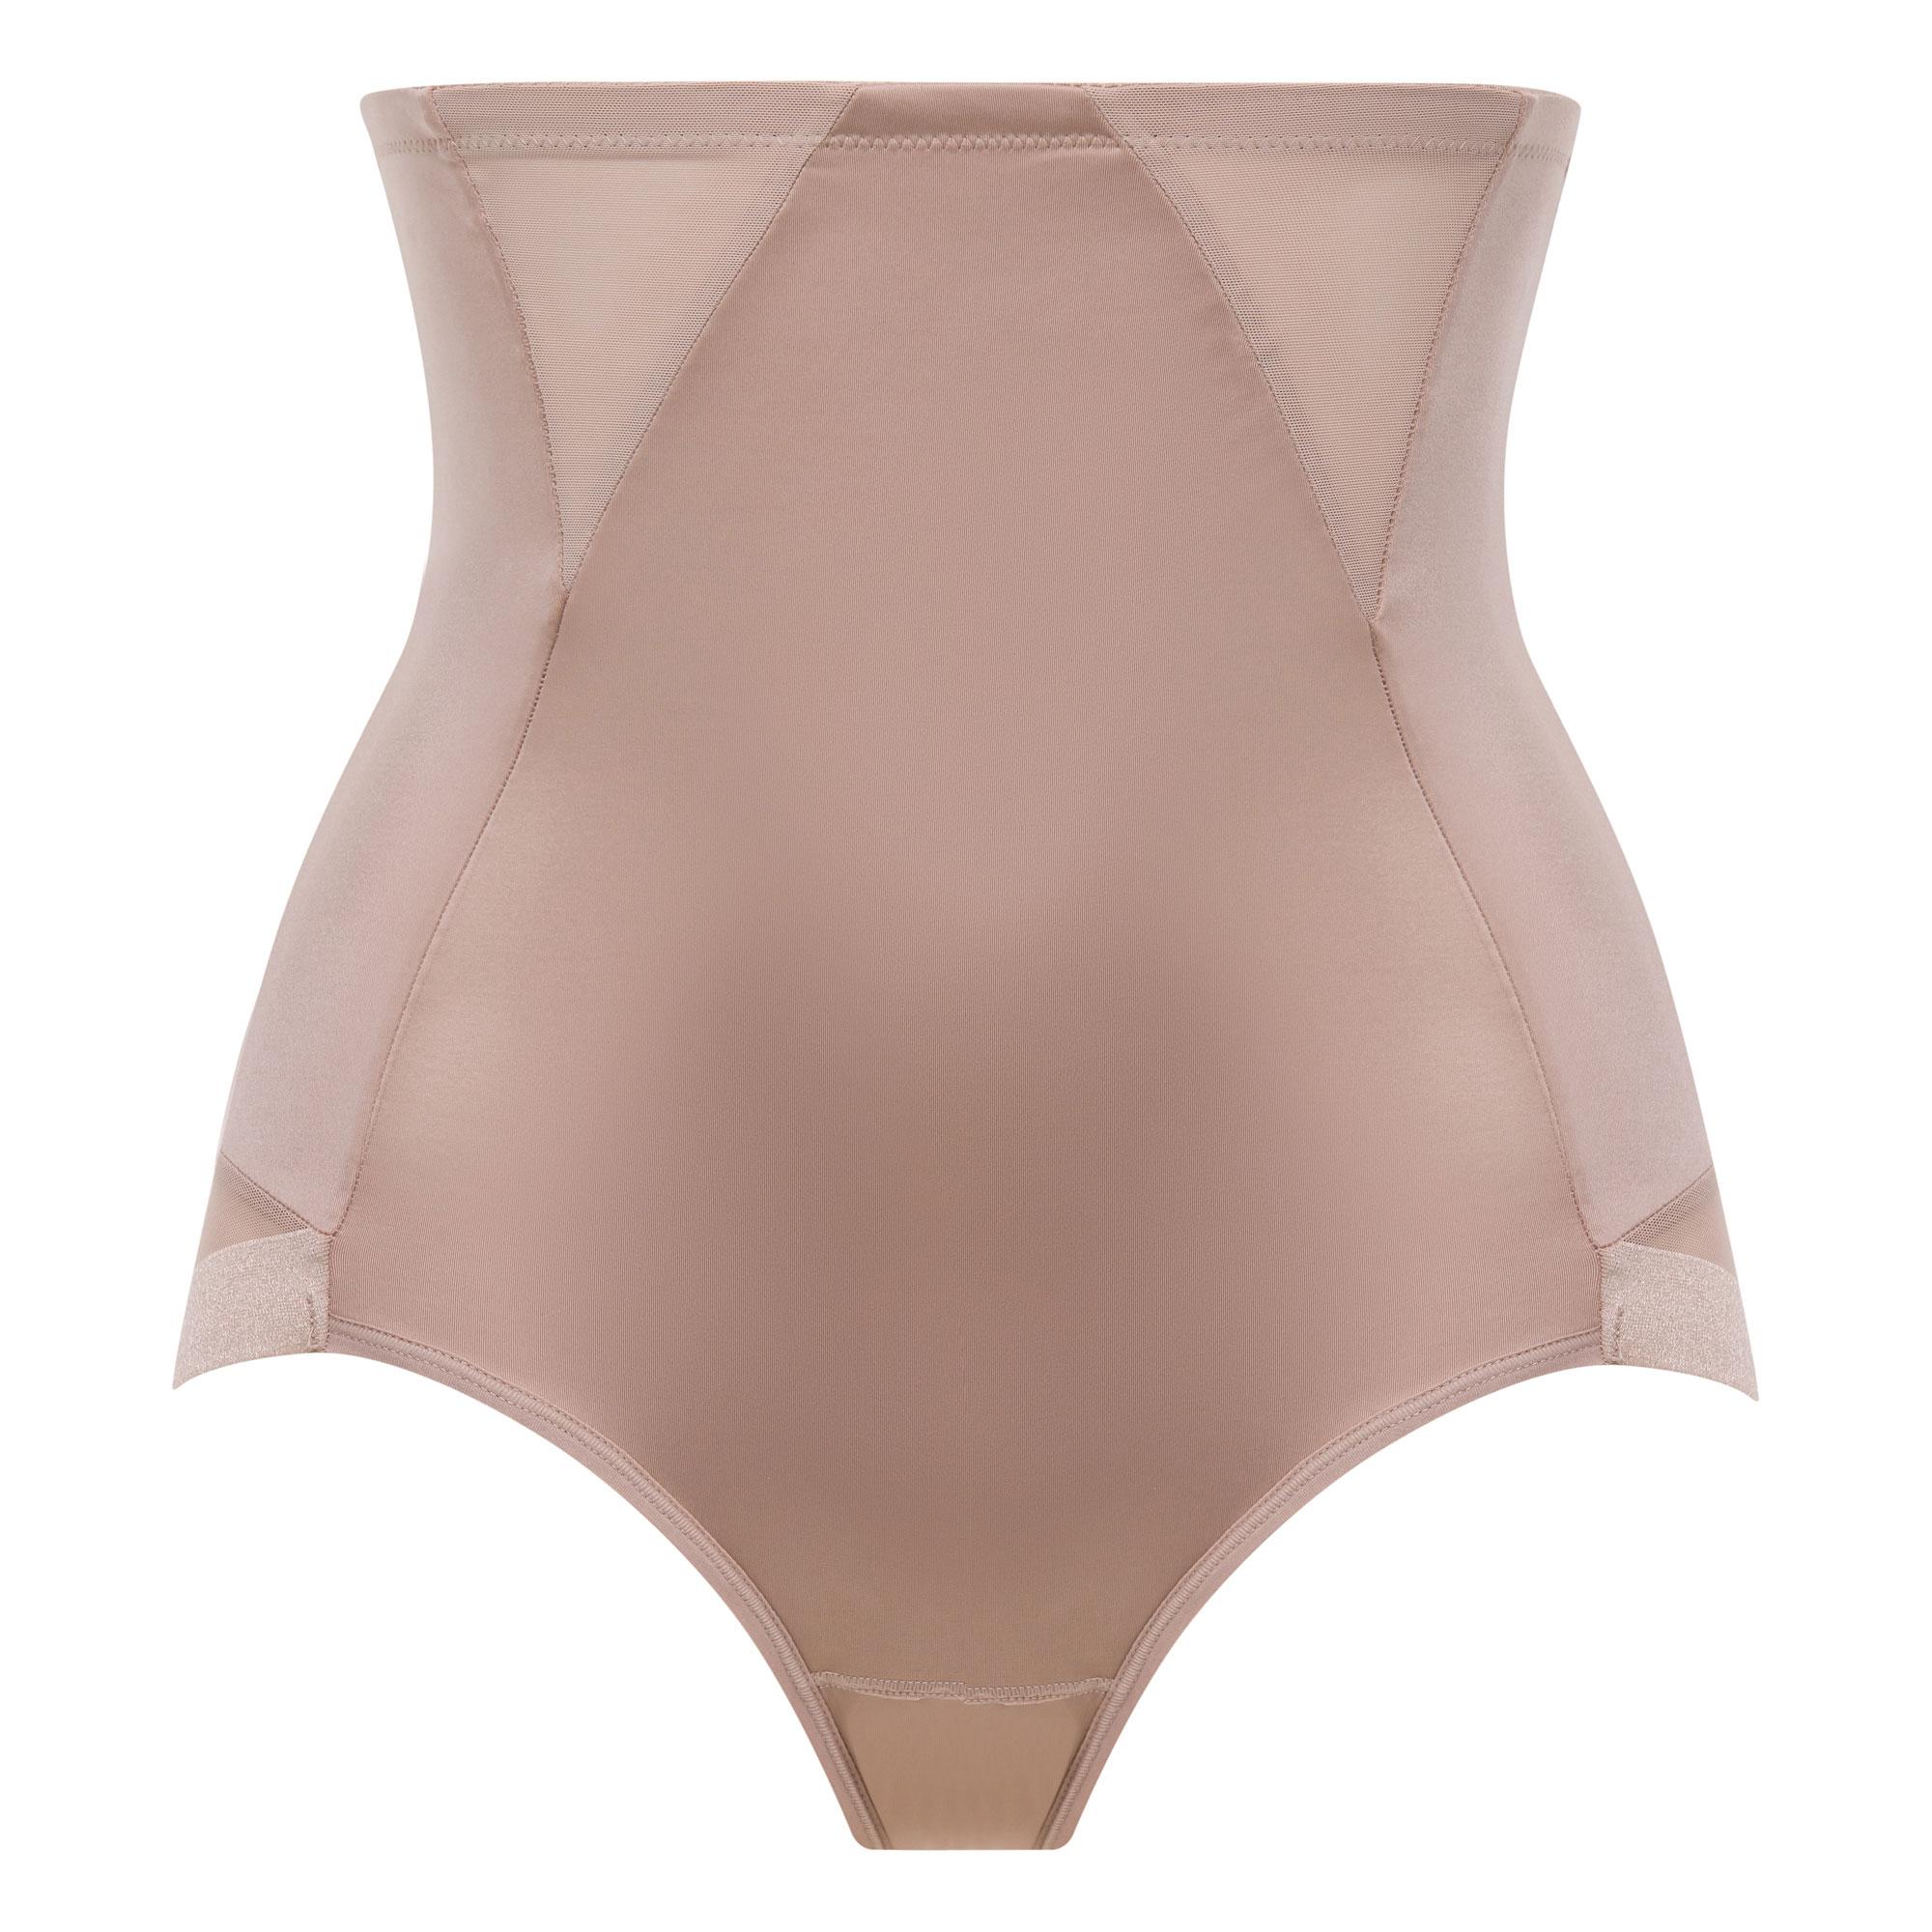 Faja corpiño beige - Perfect Silhouette, , PLAYTEX